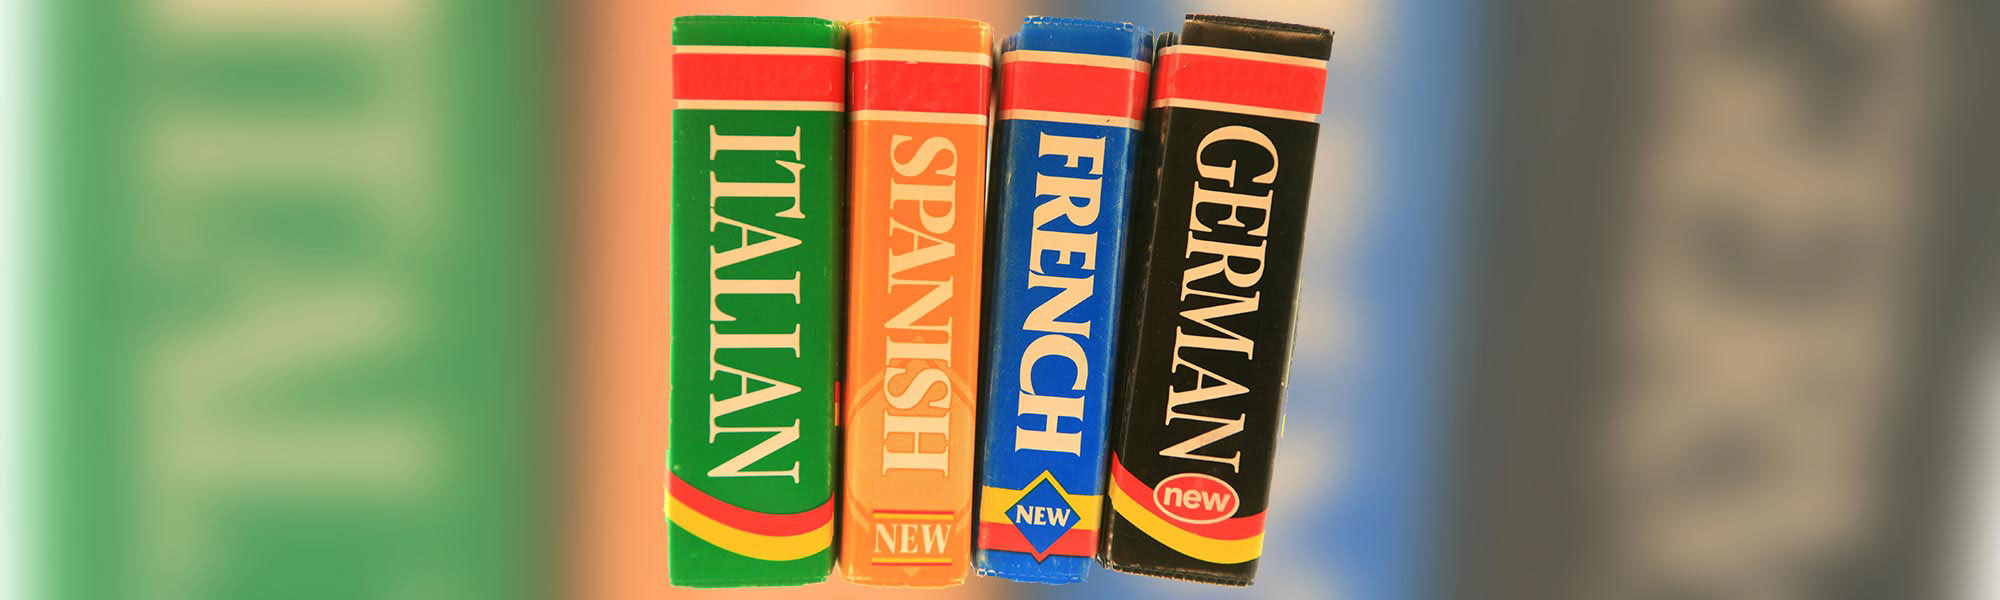 Dictionaries - French, German, Italian, Spanish